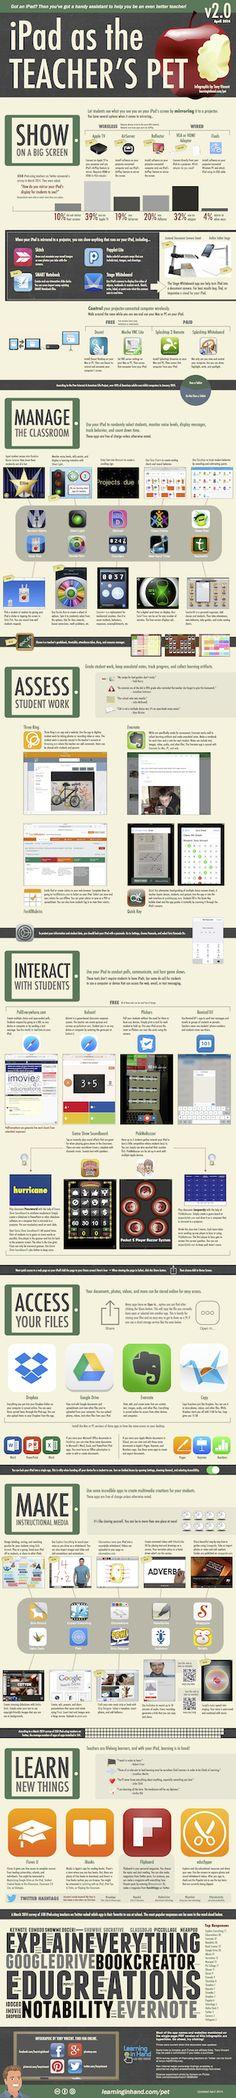 iPad as the Teacher's Pet - Version 2.0 (Updated April 2014)